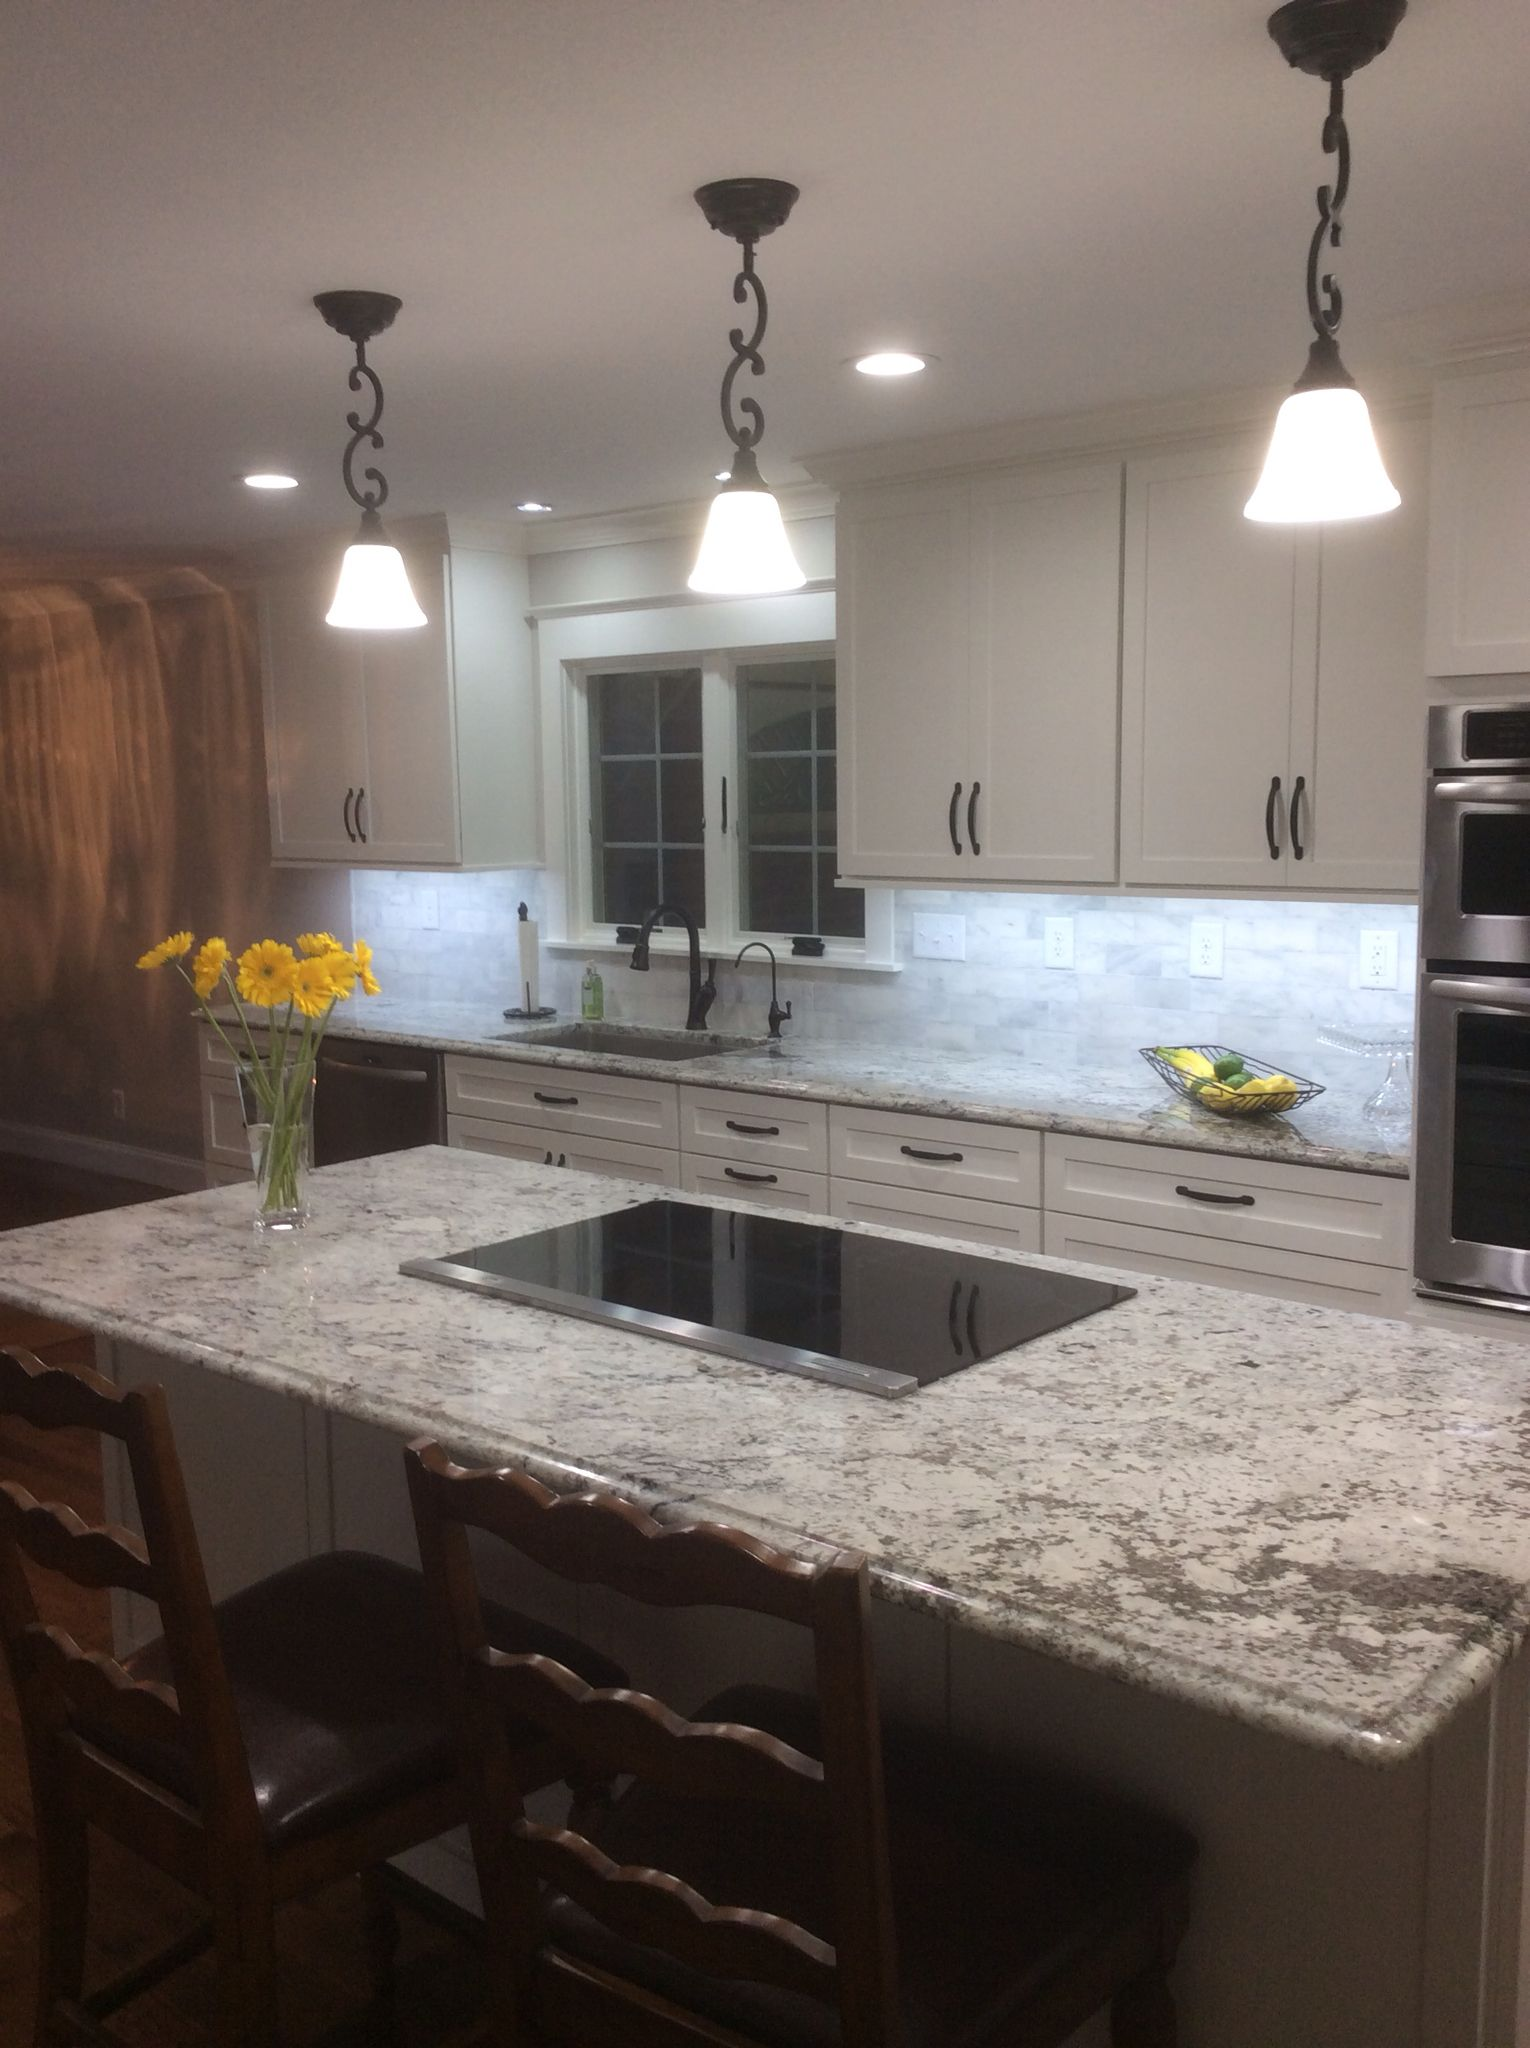 My New Kitchen White Shaker Cabinets And White Ice Granite